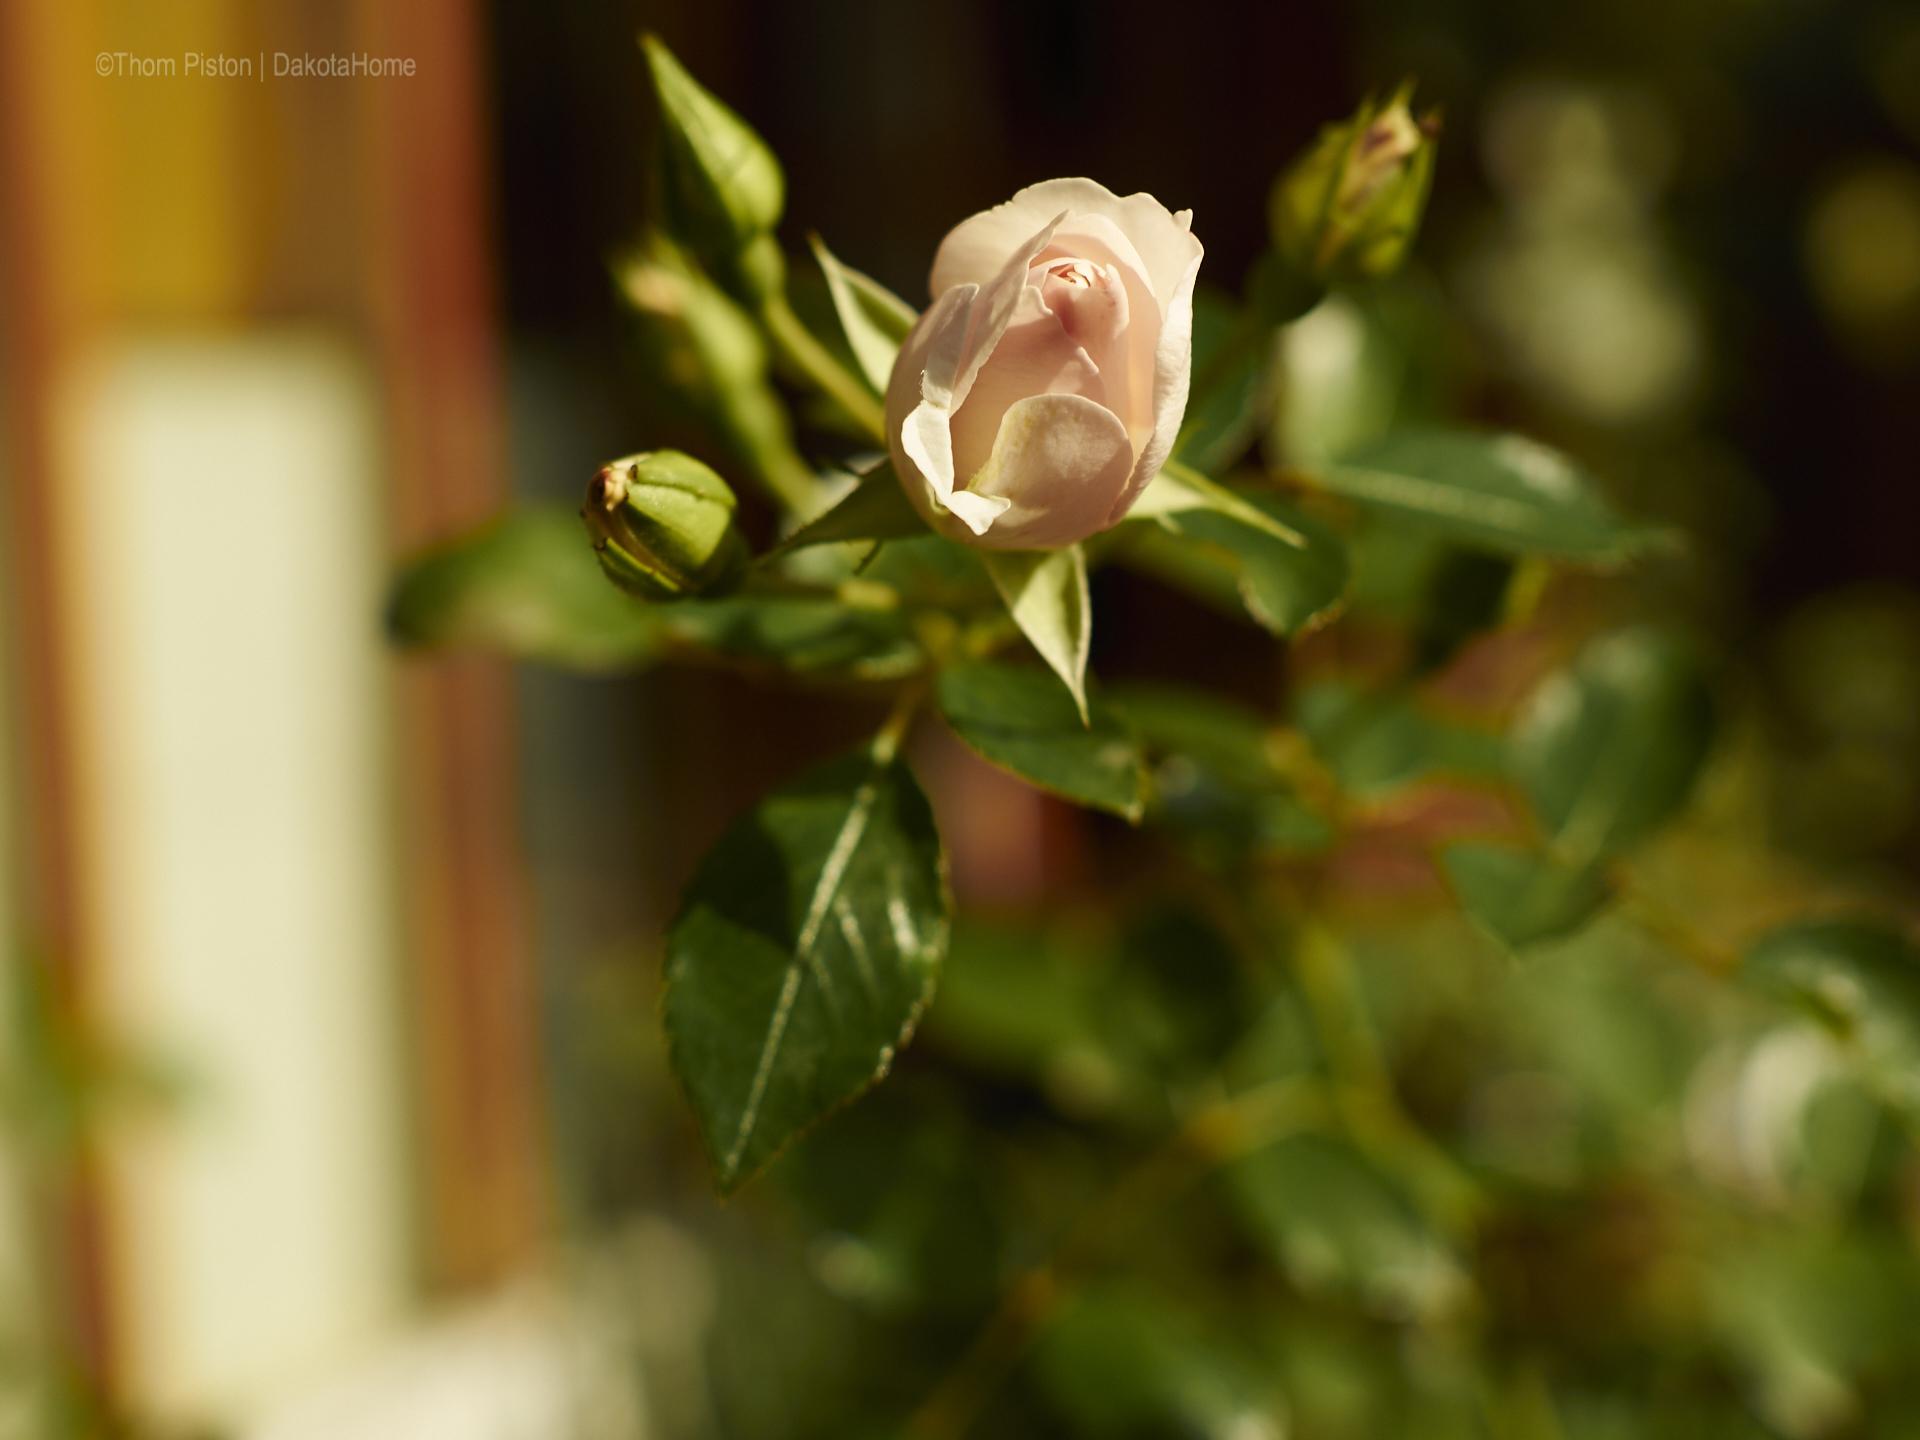 rosen at dakota home